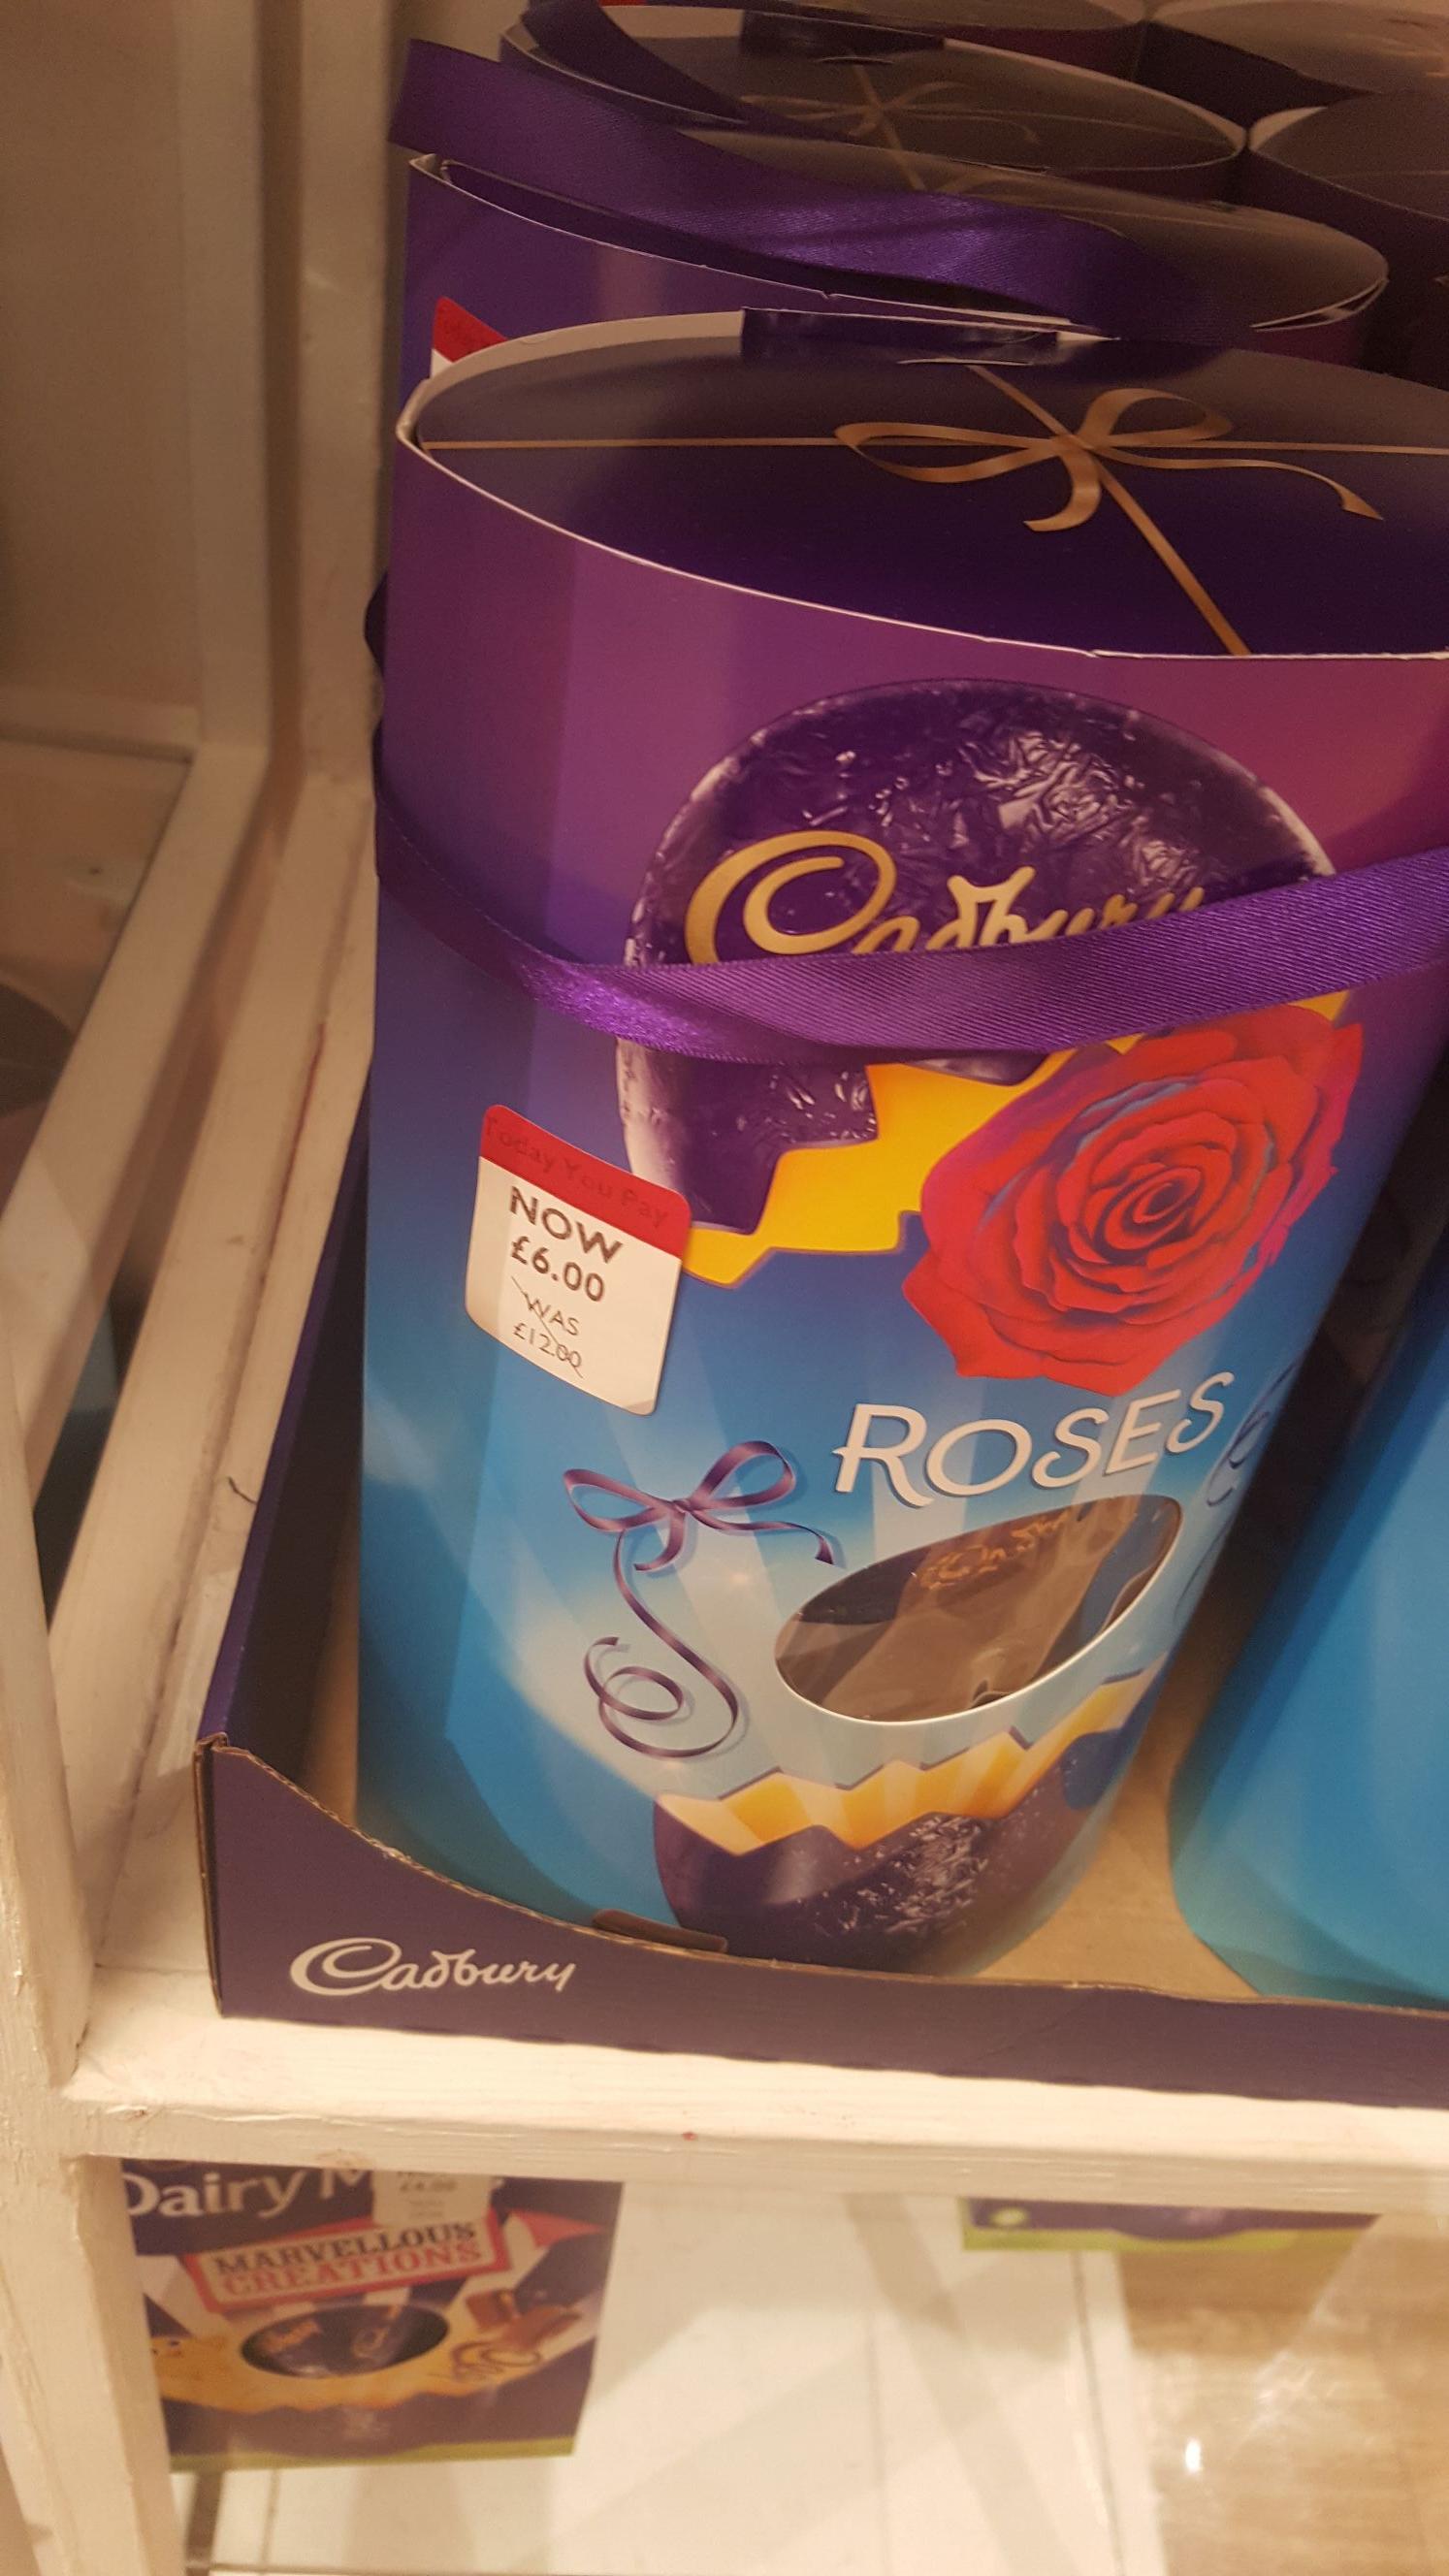 Easter Eggs Half Price instore at Debenhams (Trafford Centre)